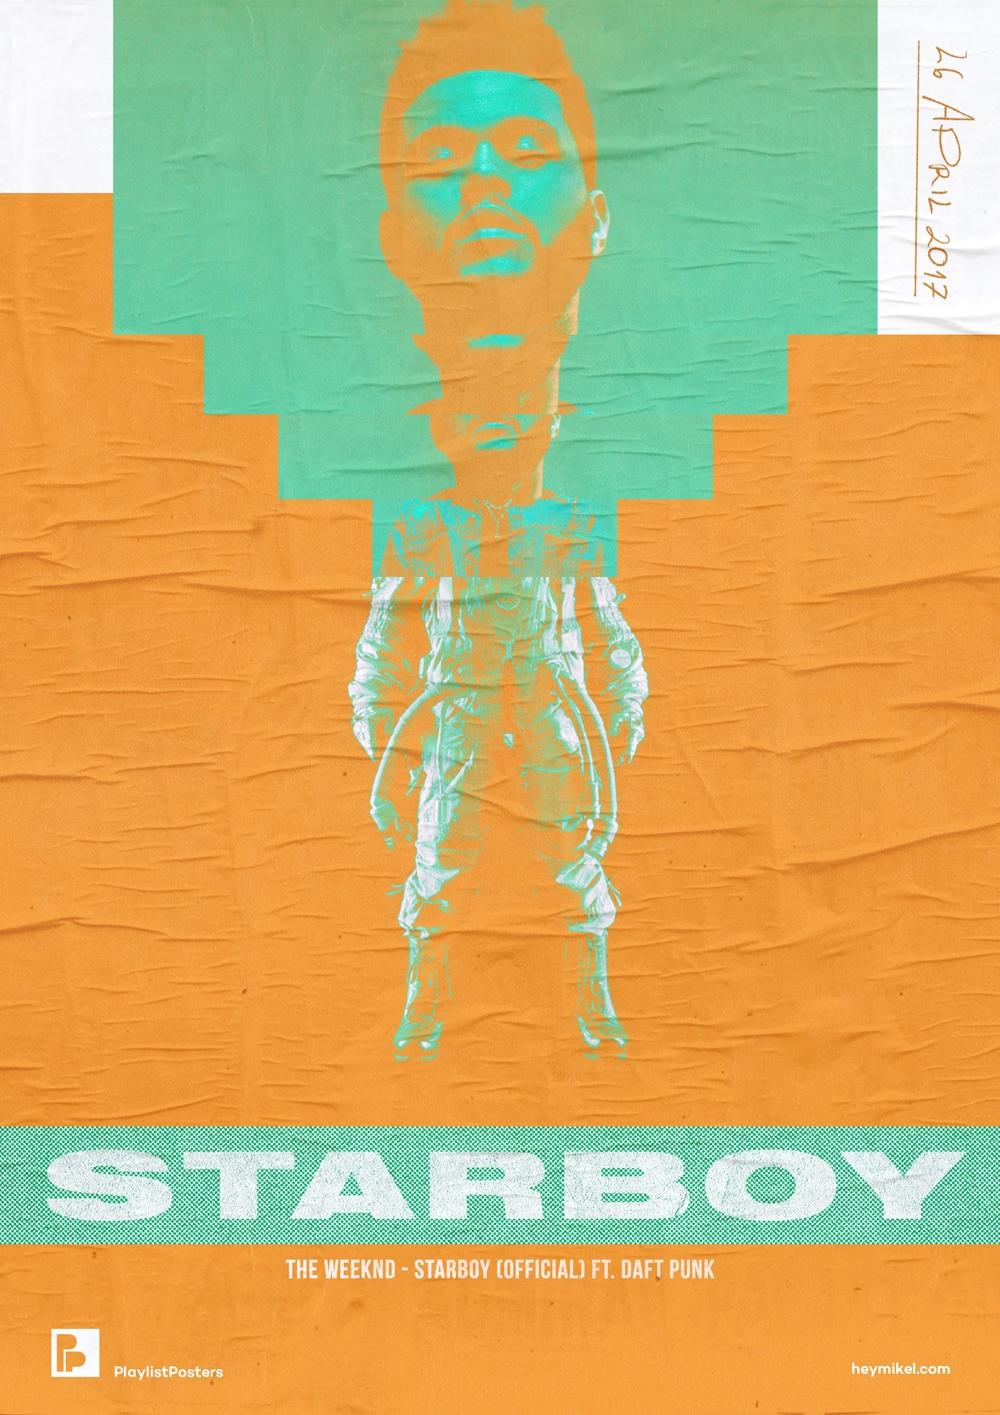 Playlist-posters // Weeknd - St - heymikel | ello